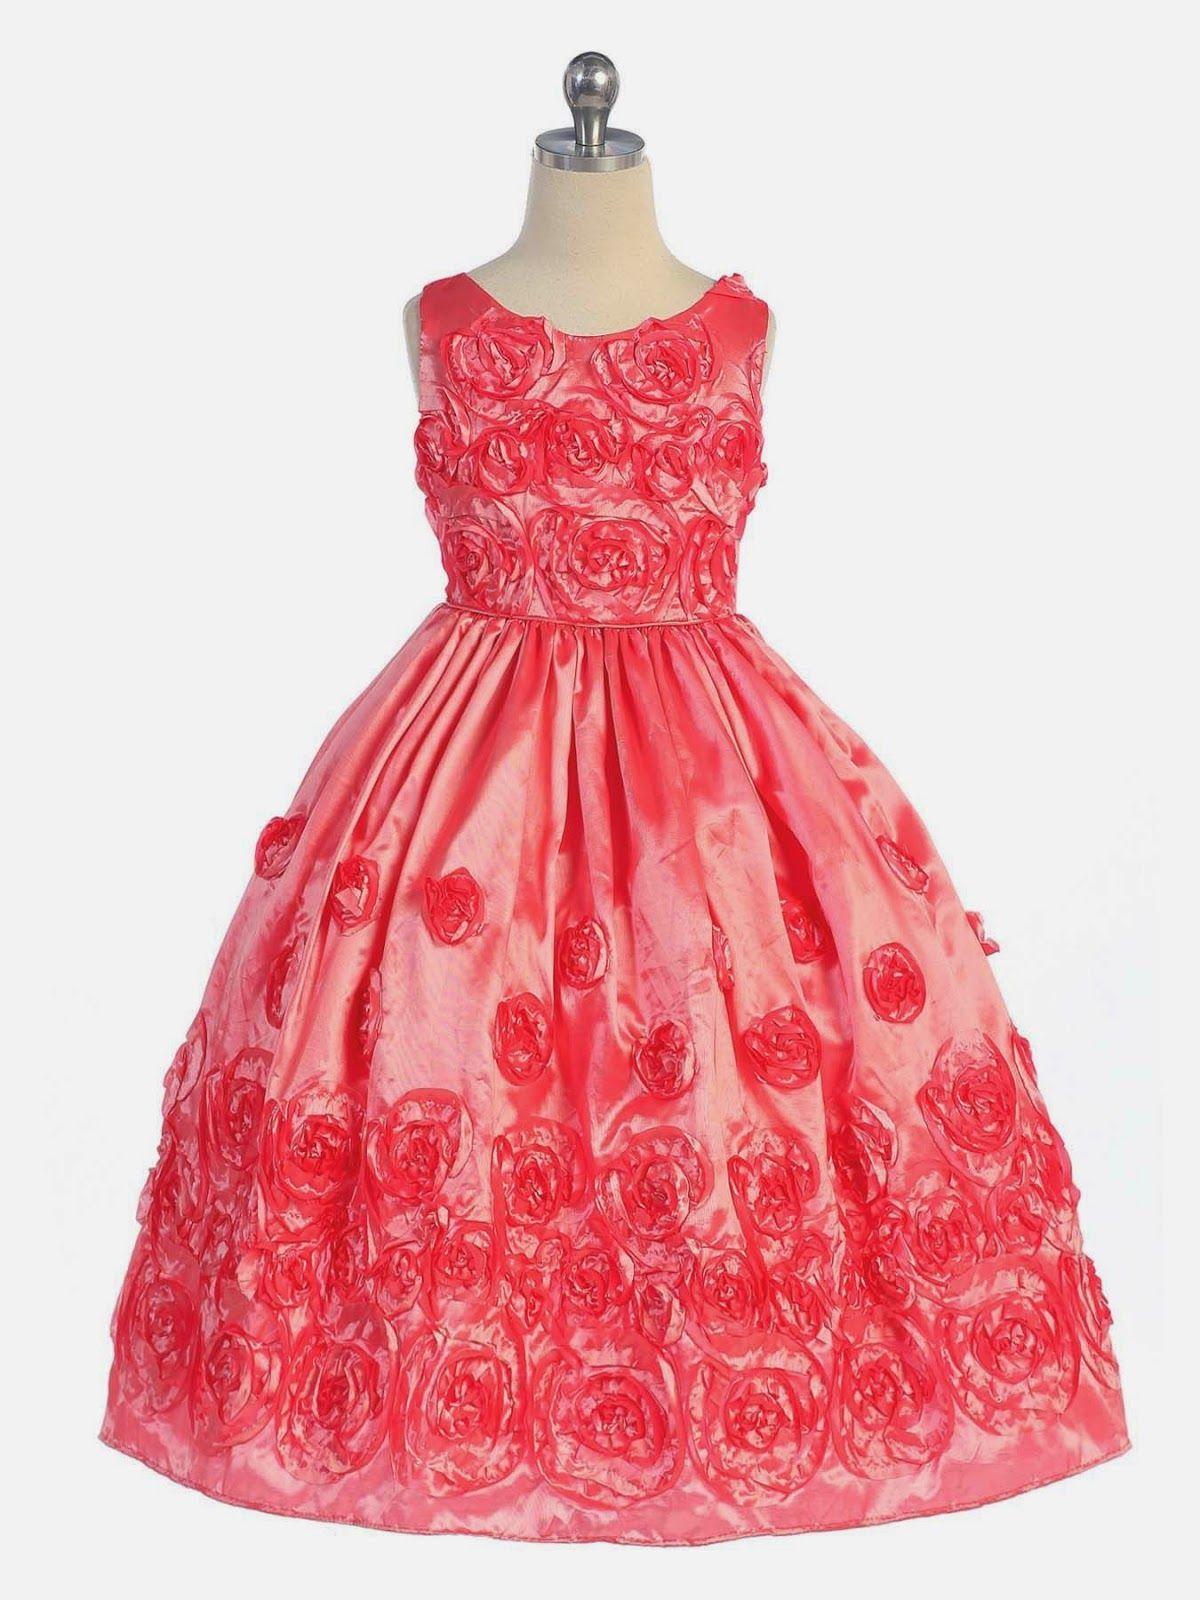 Vestidos Niña de las Flores, Color Coral | niñas fiesta | Pinterest ...